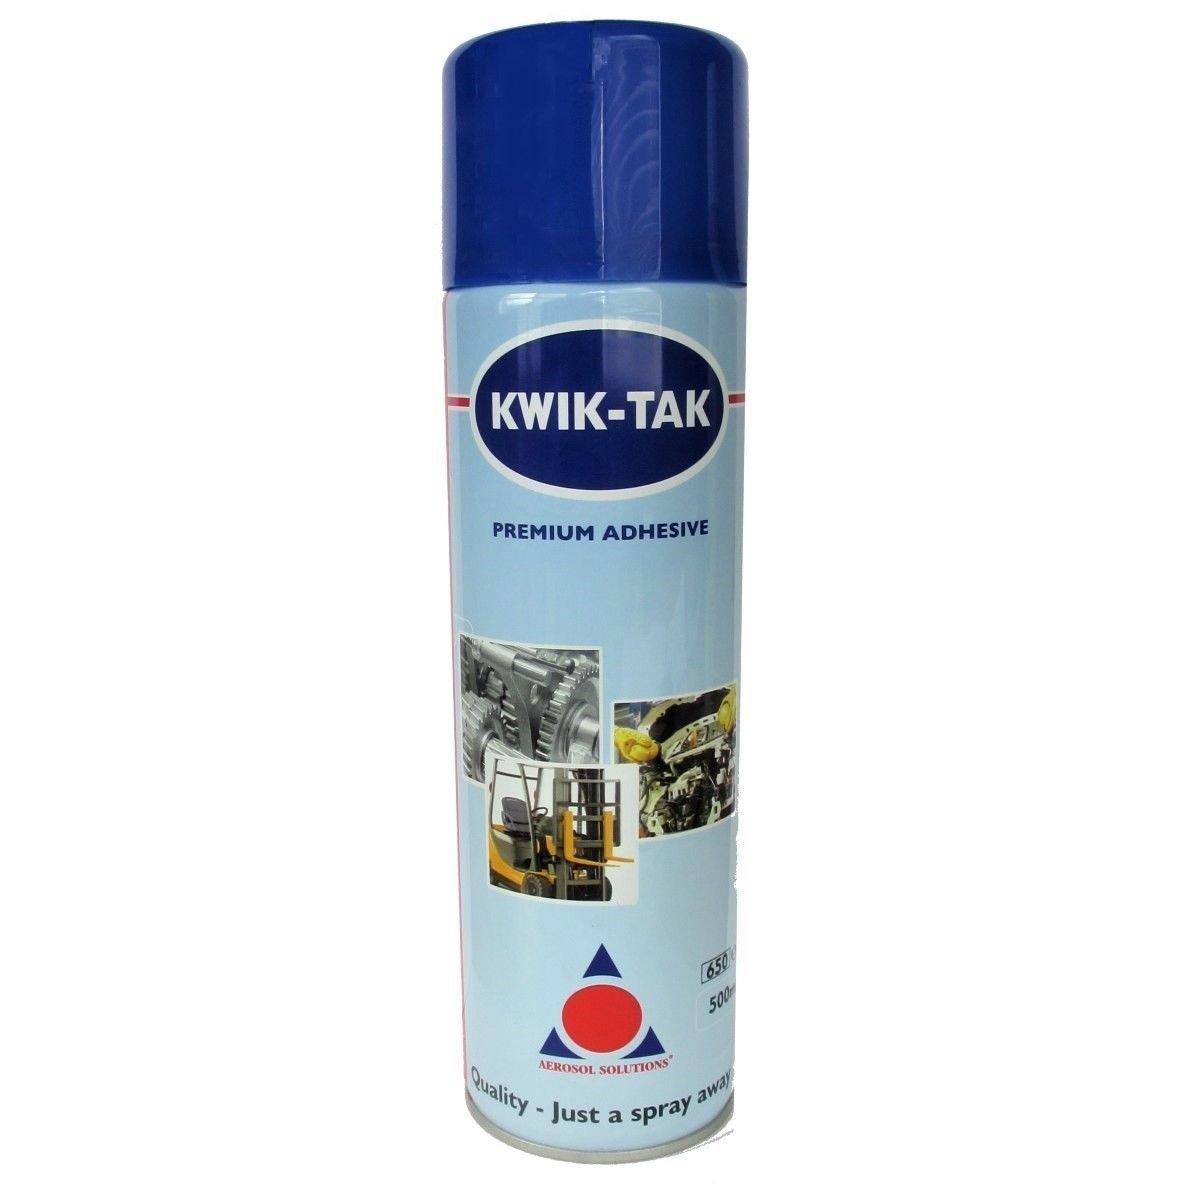 Aerosol Solution Kwik Tak Spray Premium Adhesive 500ml Kwik-Tak